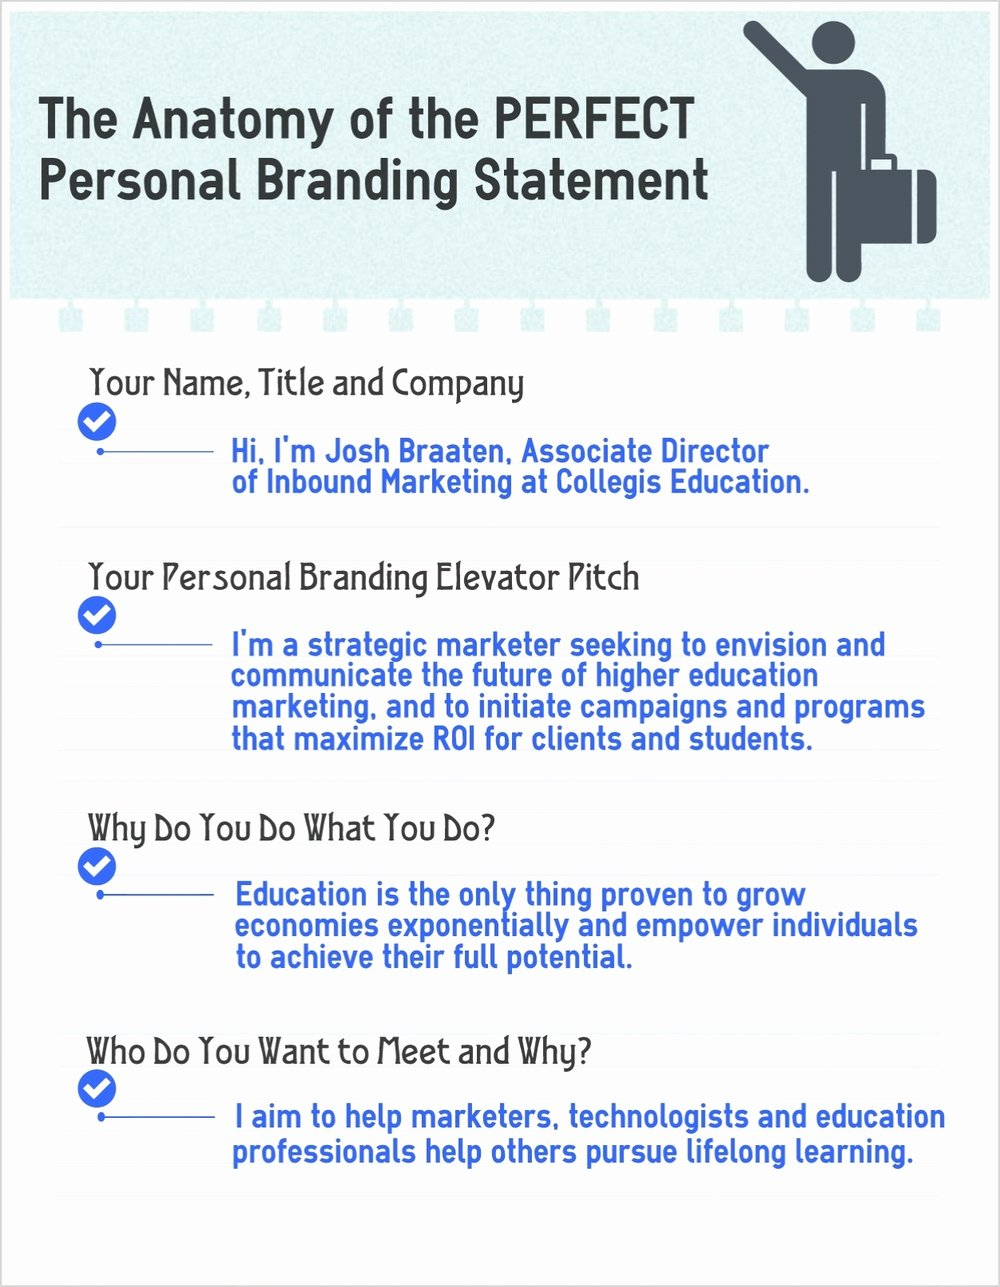 Personal Brand Statement Beautiful the Anatomy Of A Personal Branding Statement [infographic